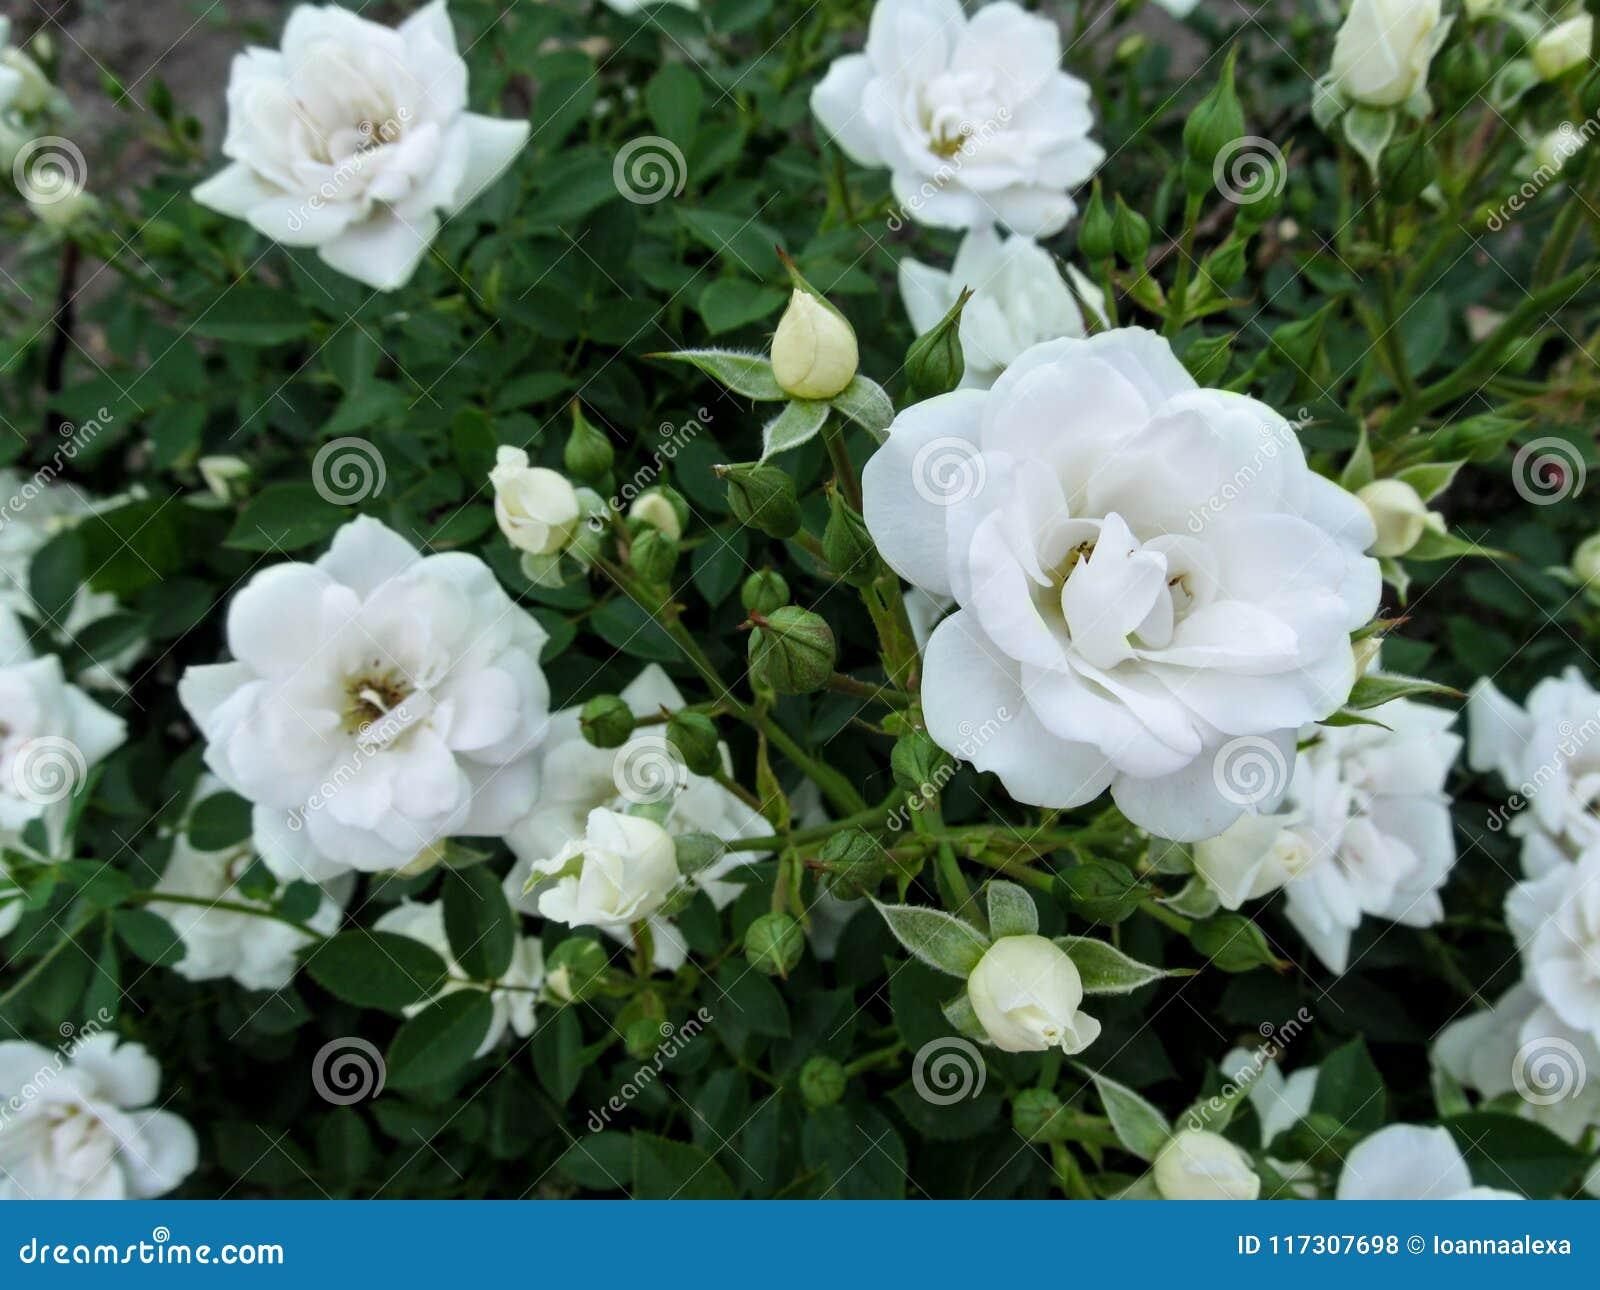 Beautiful elegant floral background with delicate white roses for beautiful elegant floral background with delicate white roses for wedding design mightylinksfo